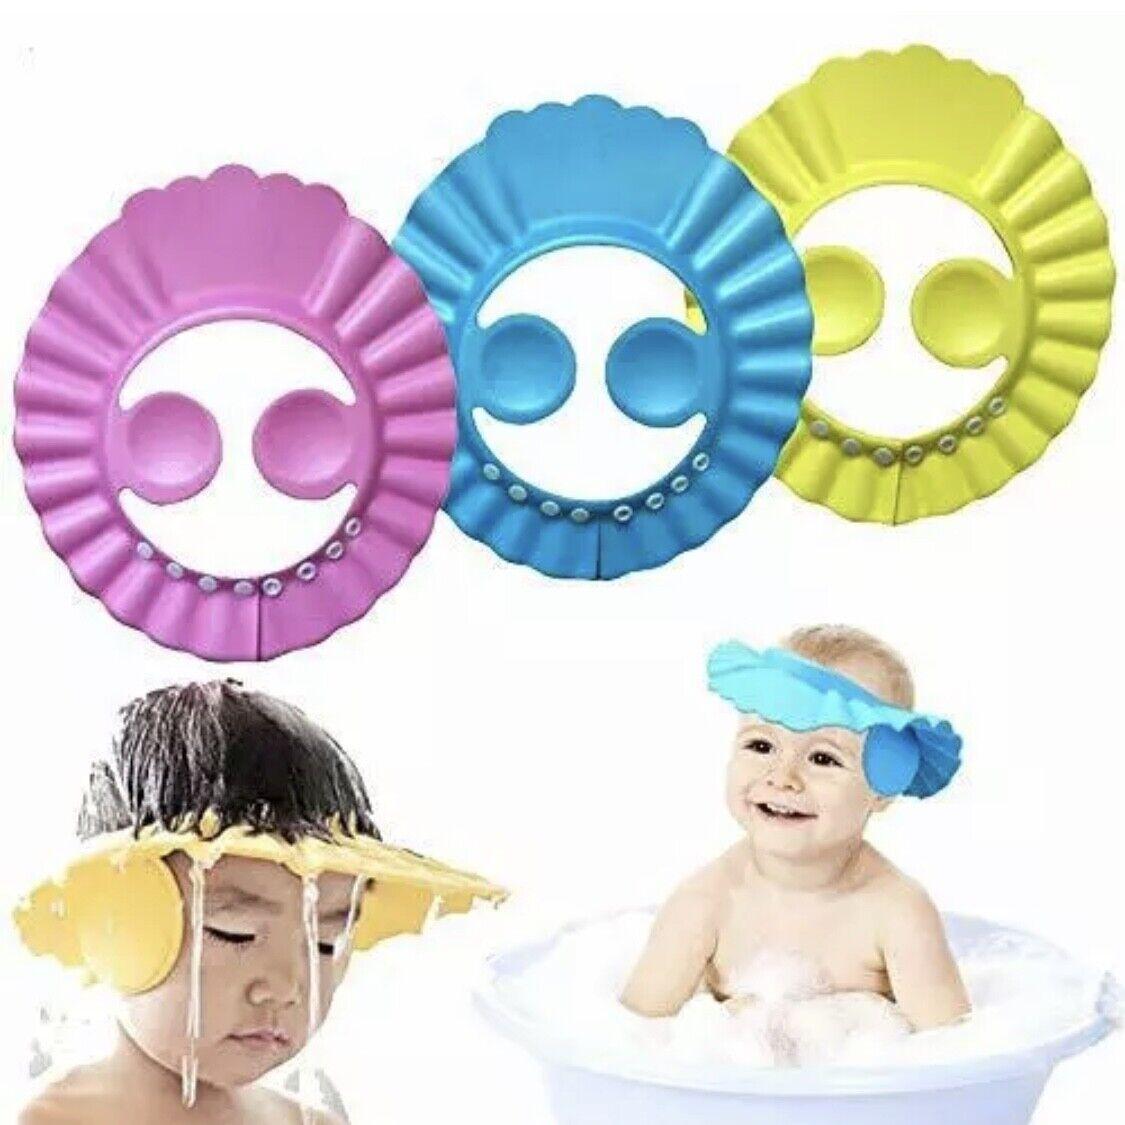 New Adjustable Kids Baby Shampoo Bath Bathing Shower Cap Hat